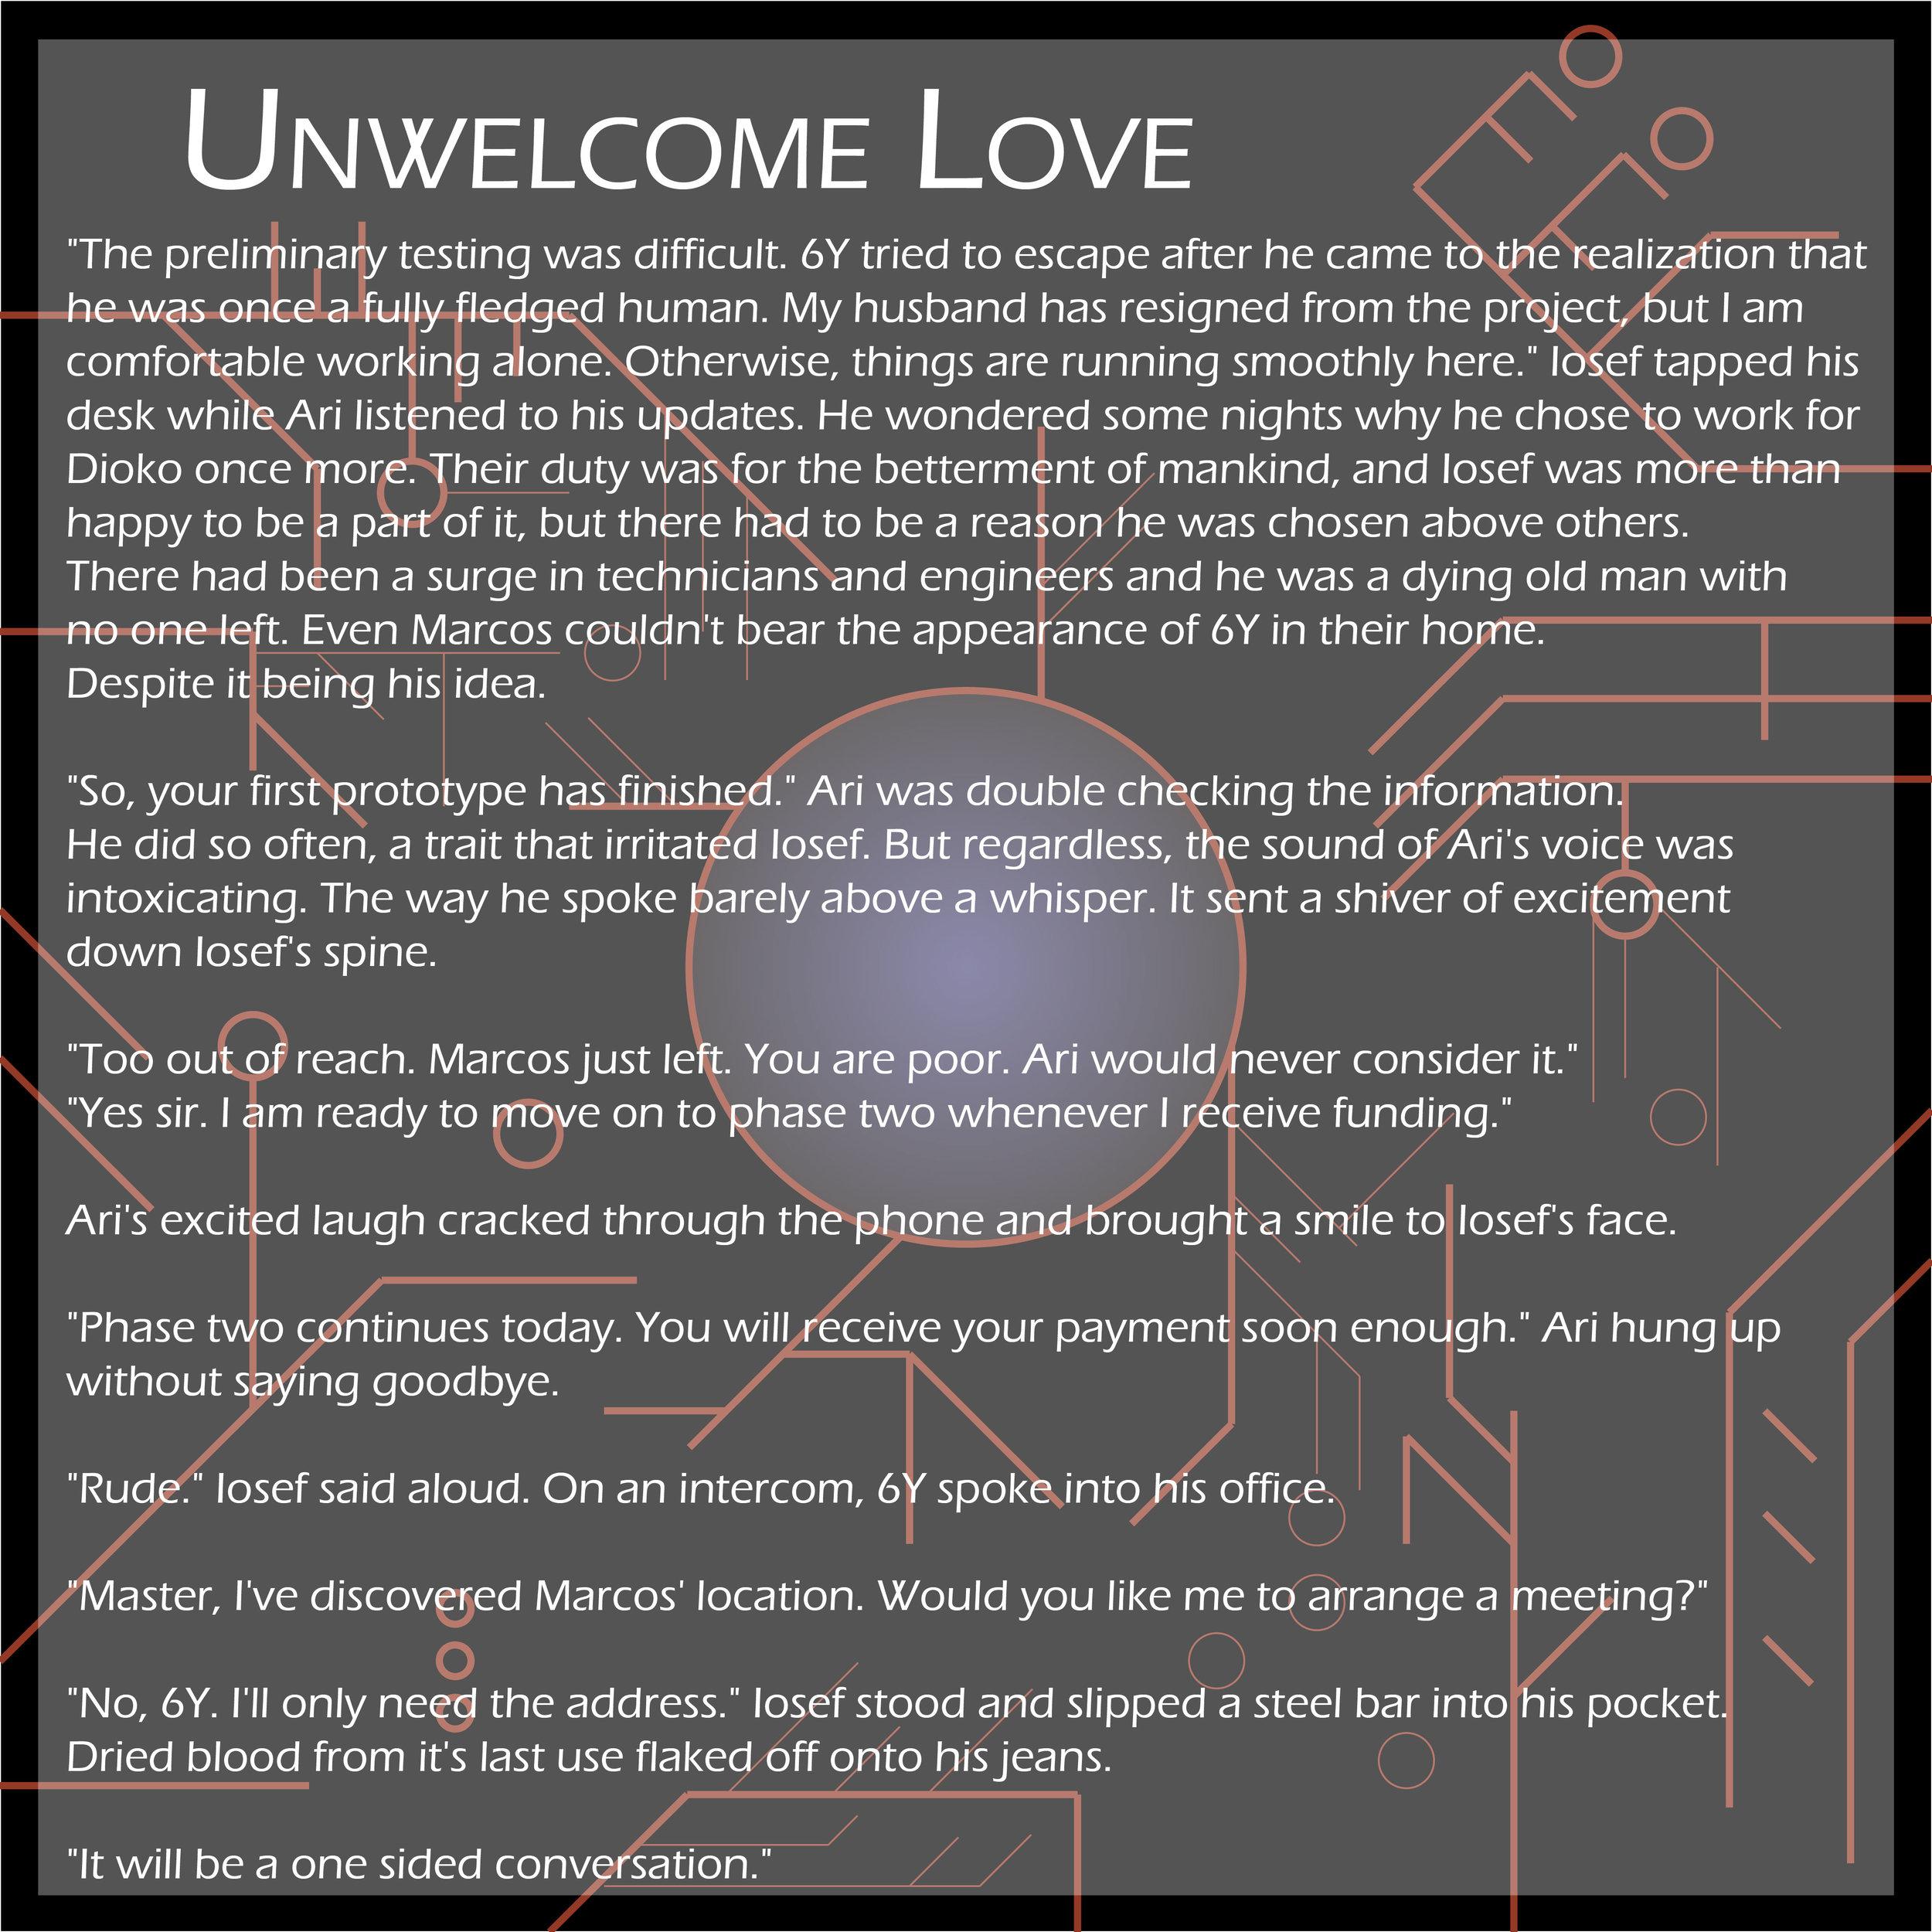 3WAR.UV2 - Unwelcome Love.jpg